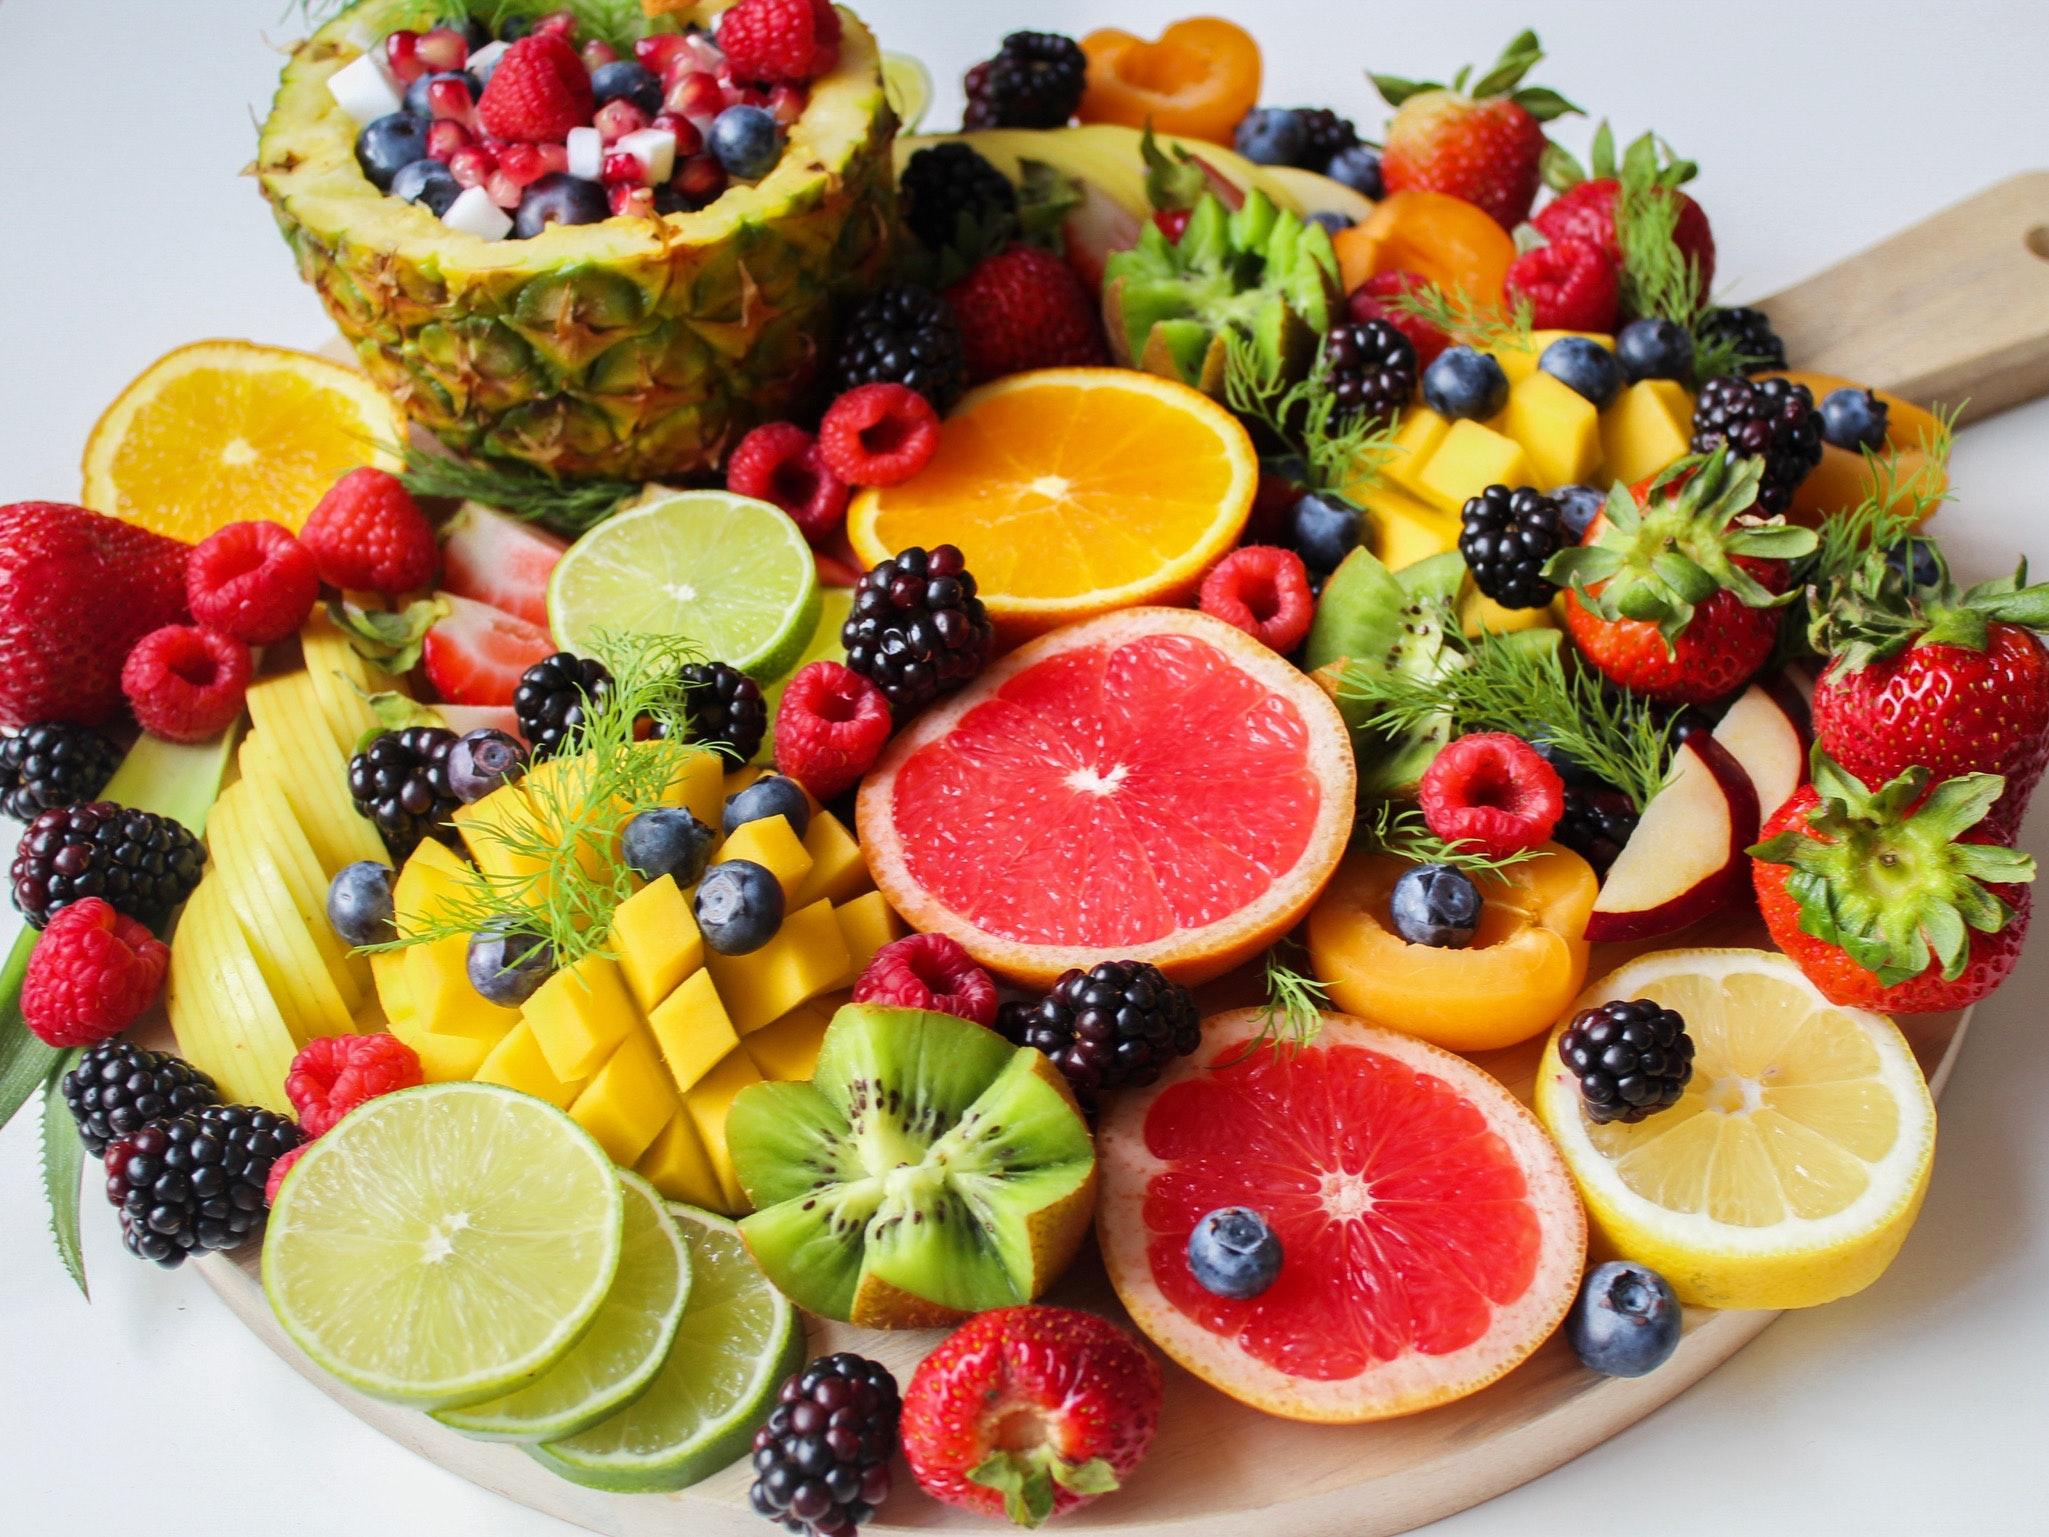 berries-citrus-citrus-fruits-1132047.jpg